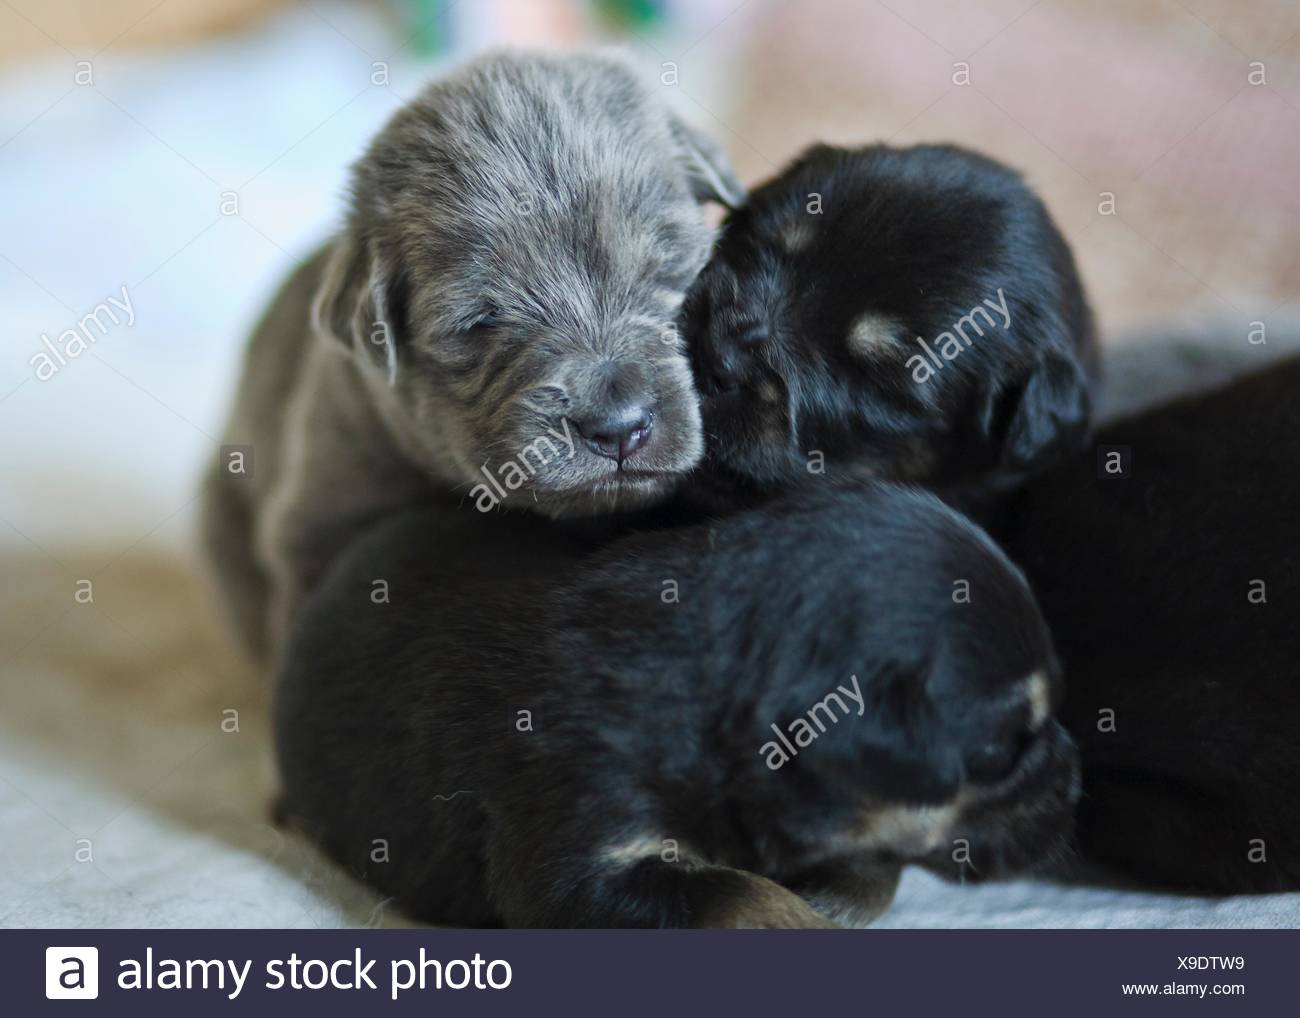 Tibetan Mastiff puppies Stock Photo: 281202693 - Alamy